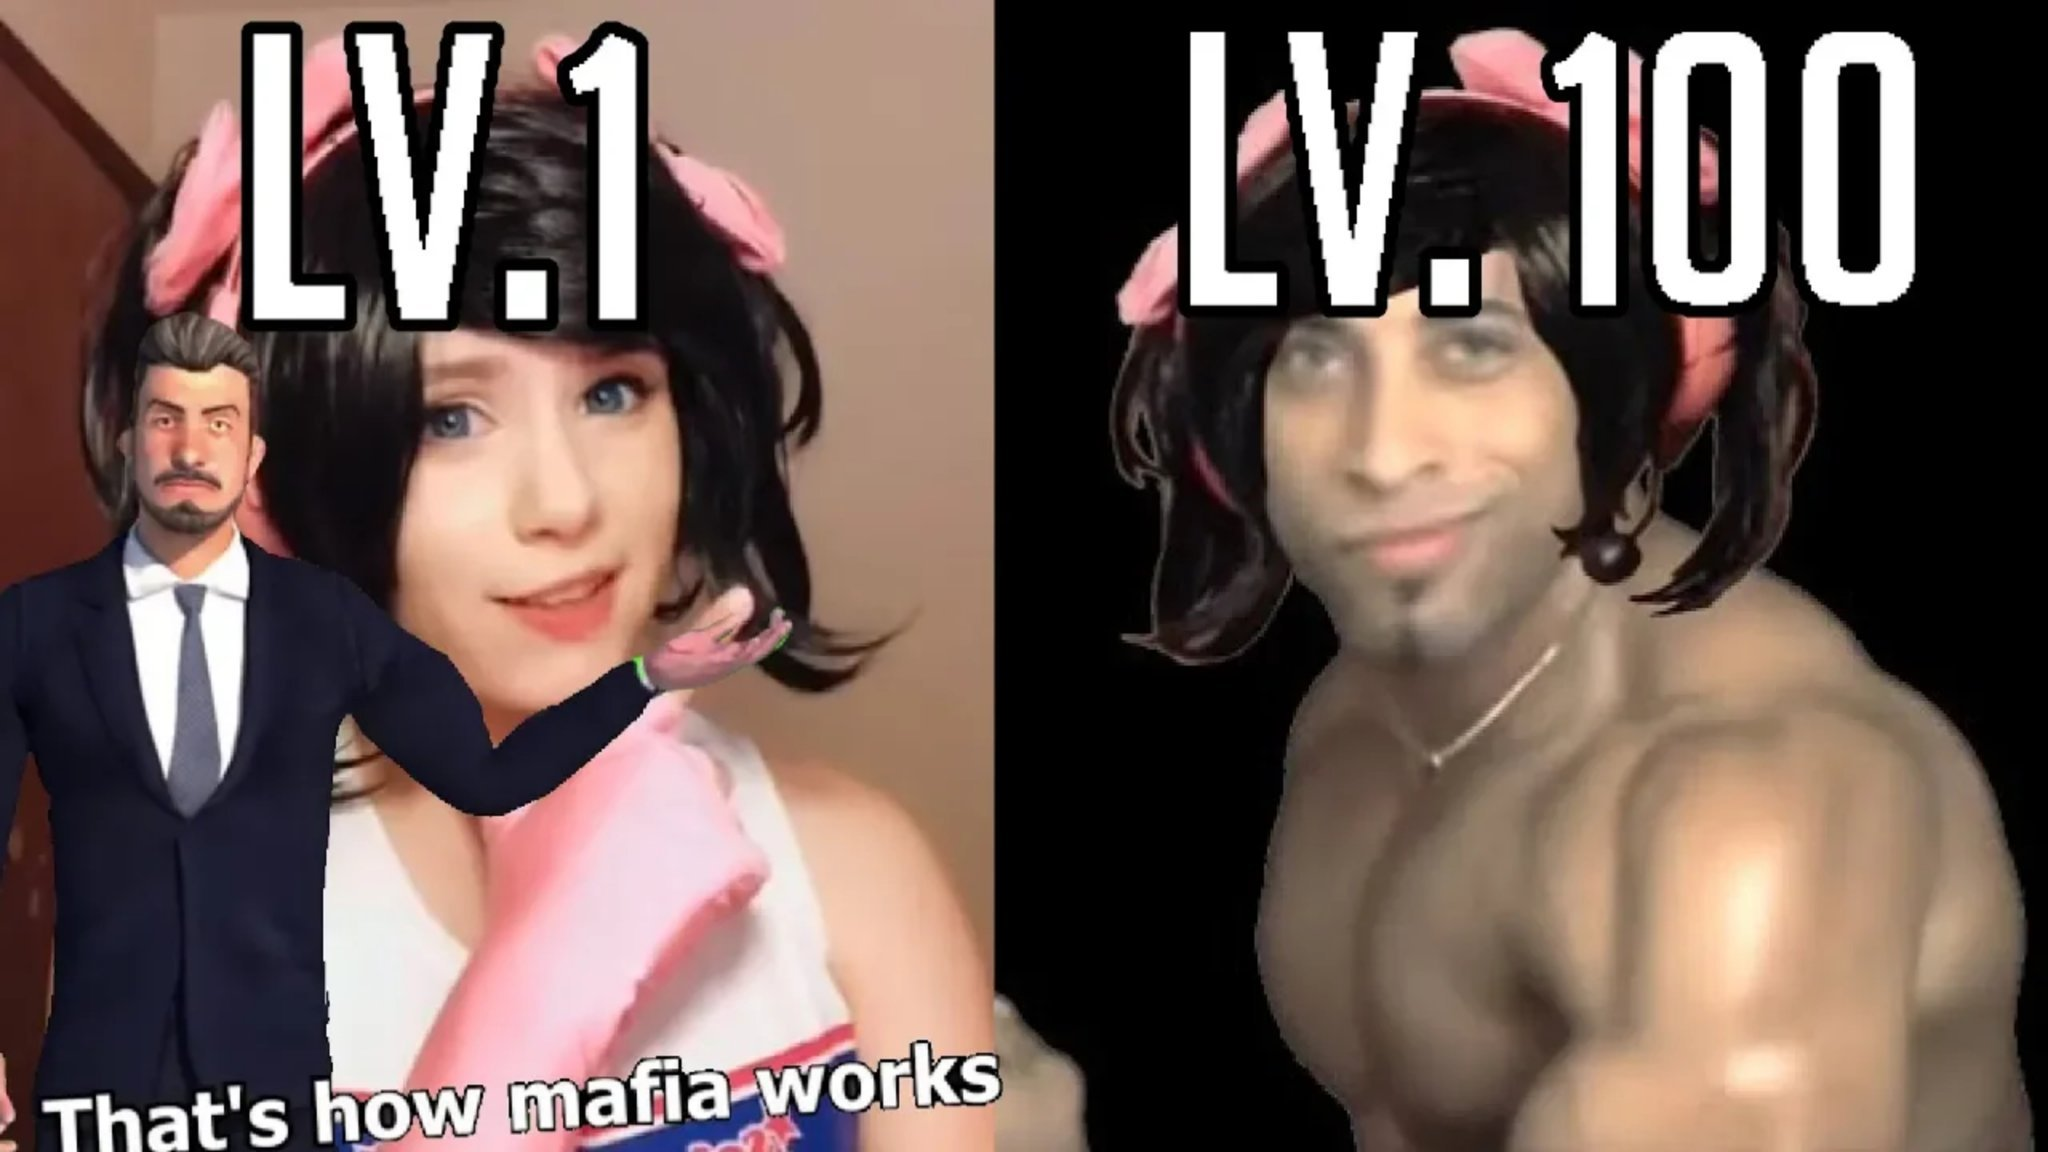 Its that simple - meme